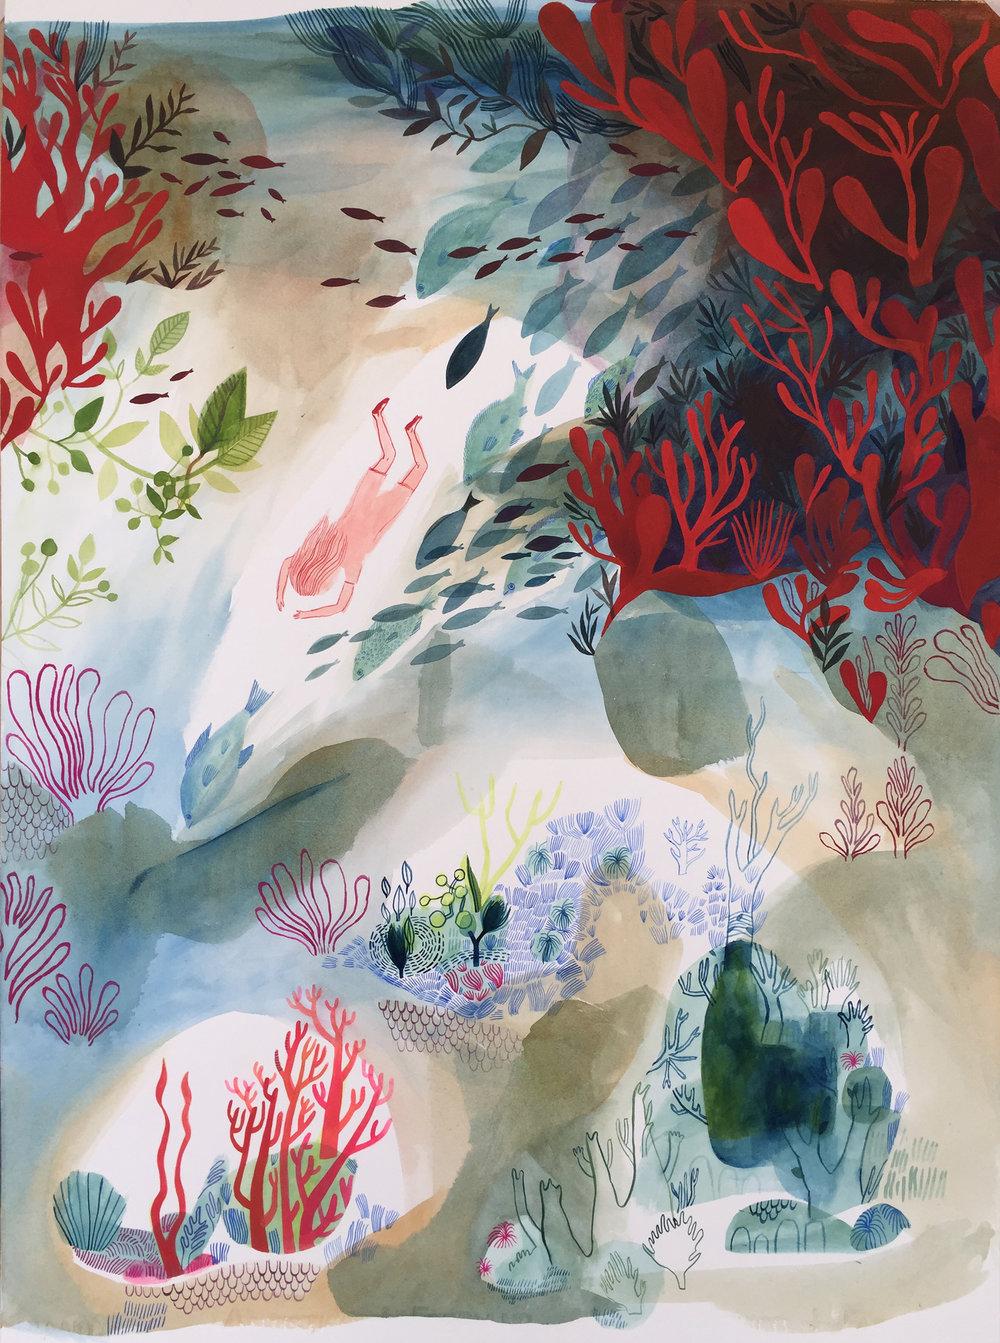 'The Diver' / 2017 / Gouache on paper